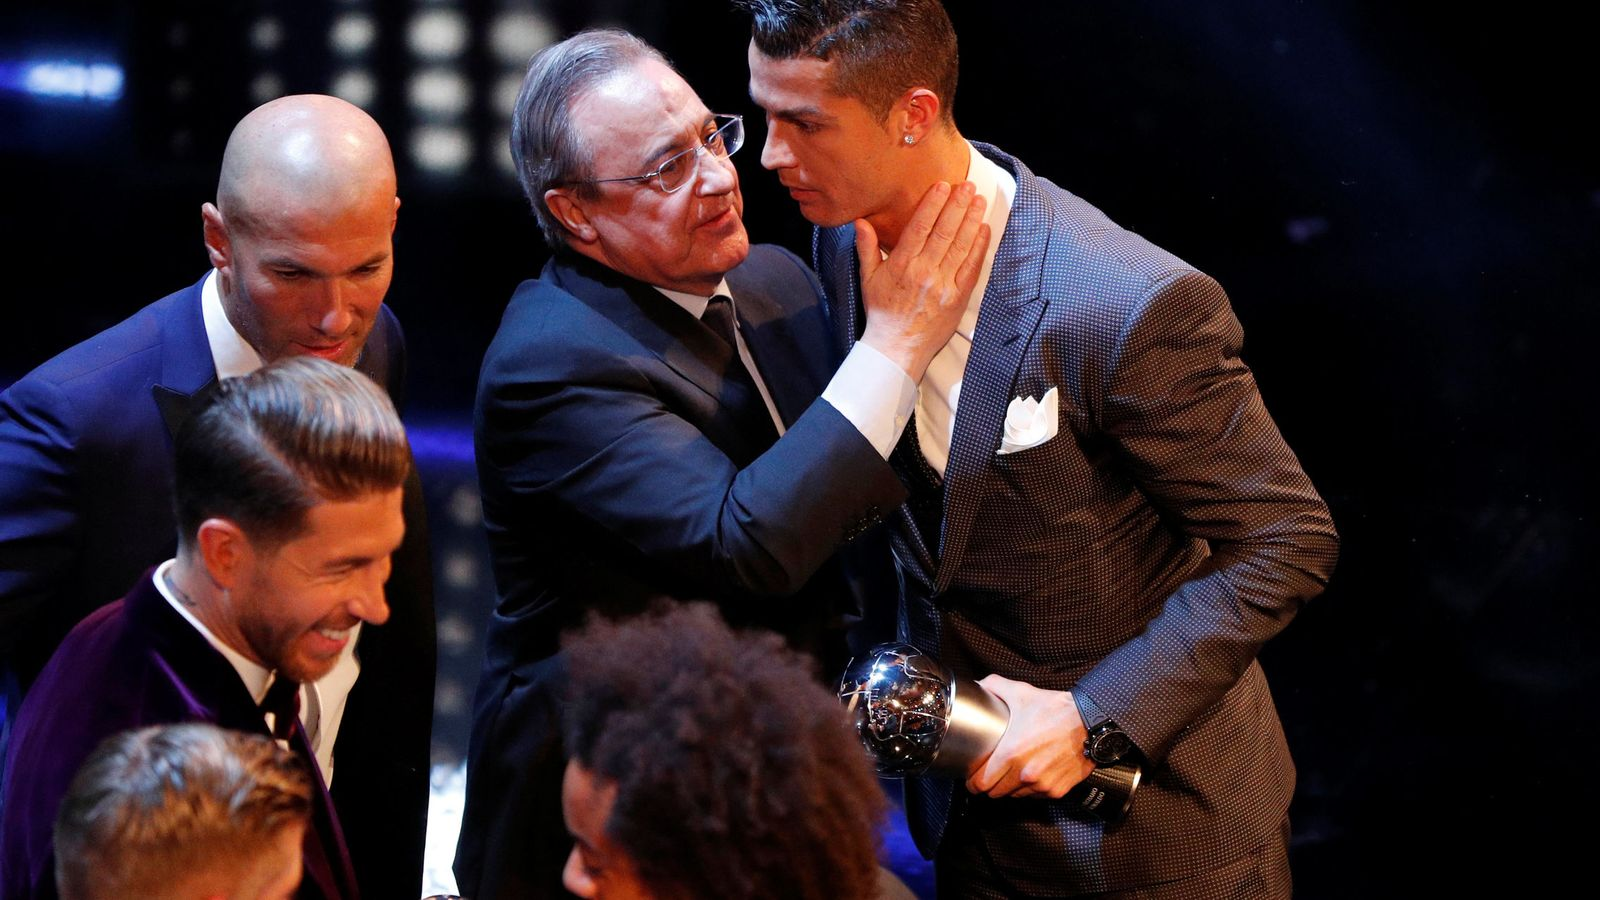 Foto: Florentino Pérez con Cristiano Ronaldo en el día que el portugués ganó el trofeo 'The Best'. (Reuters)